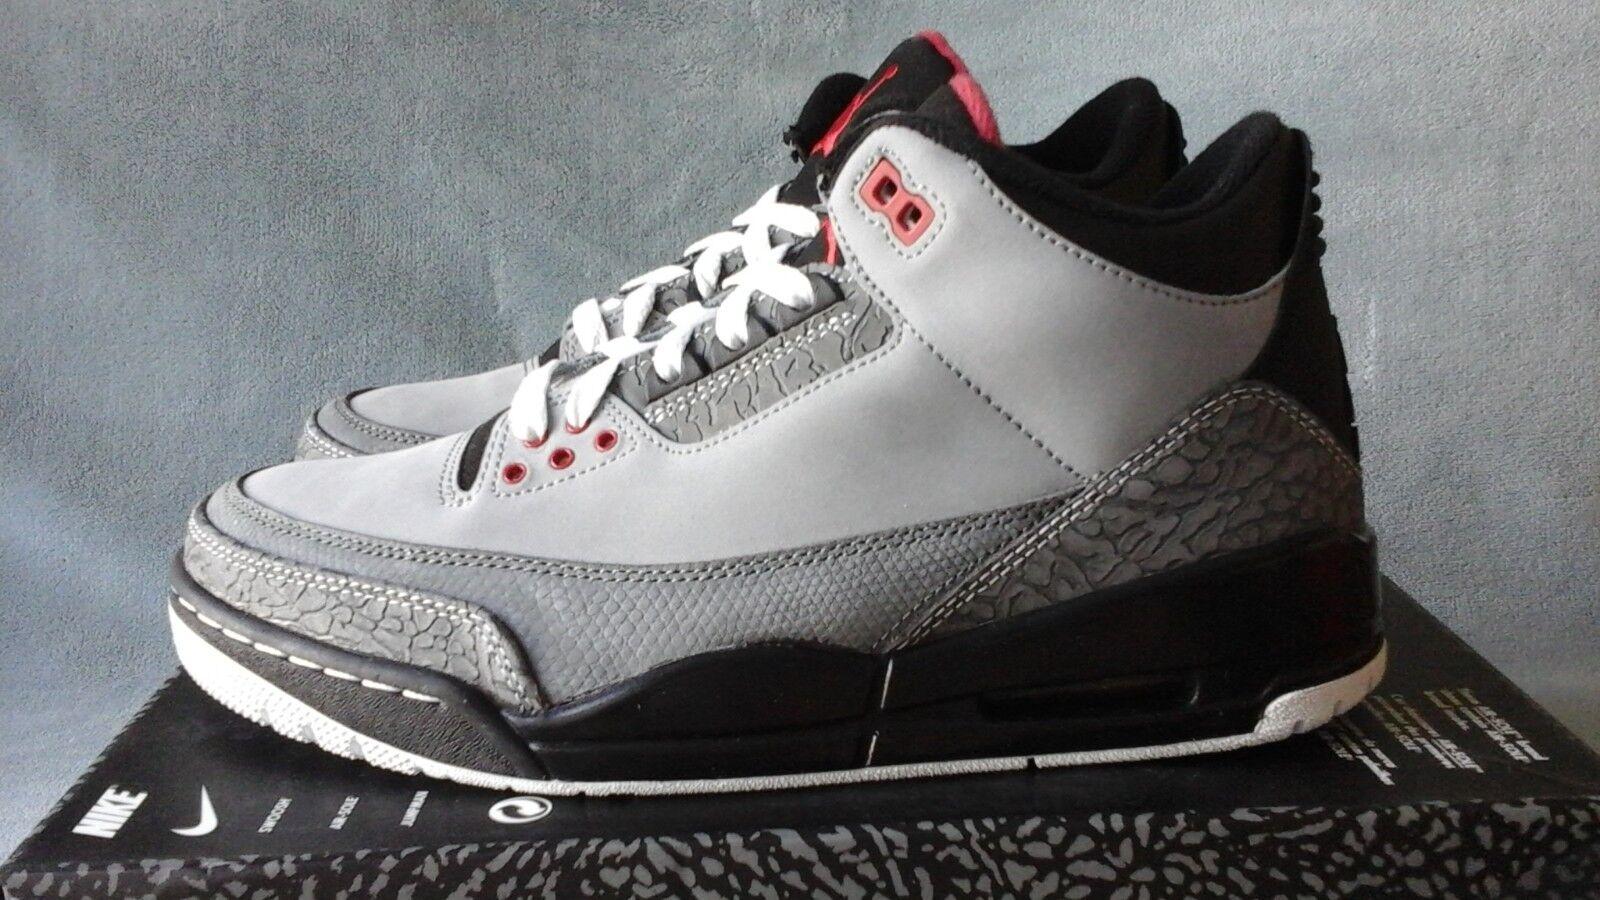 2011 Nike Air Jordan 3 Retro Grey Stealth 136064-003 Size 9